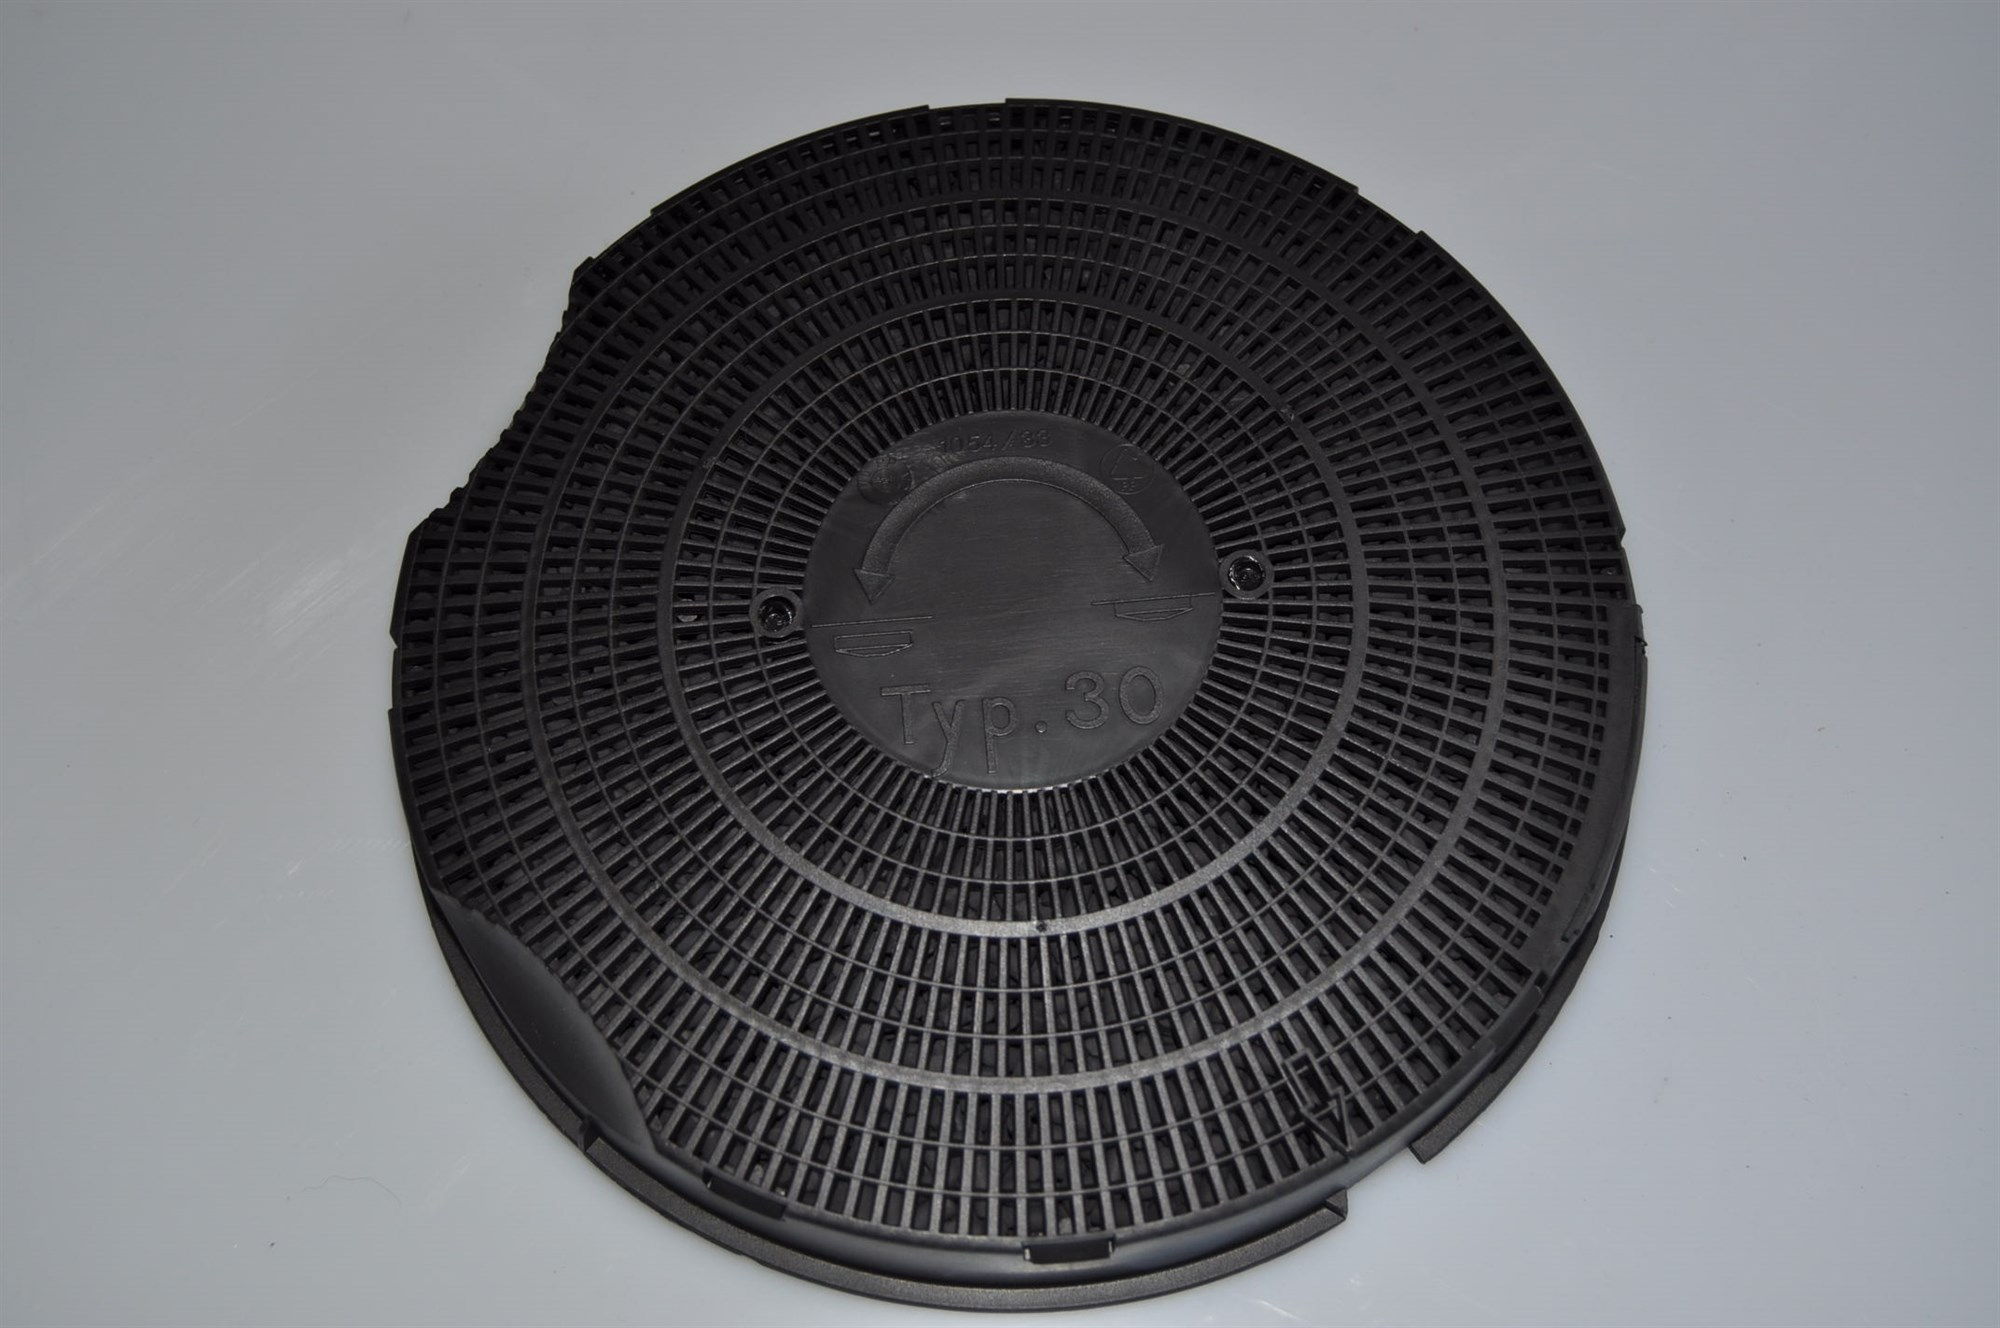 Kohlefilter juno electrolux dunstabzugshaube mm